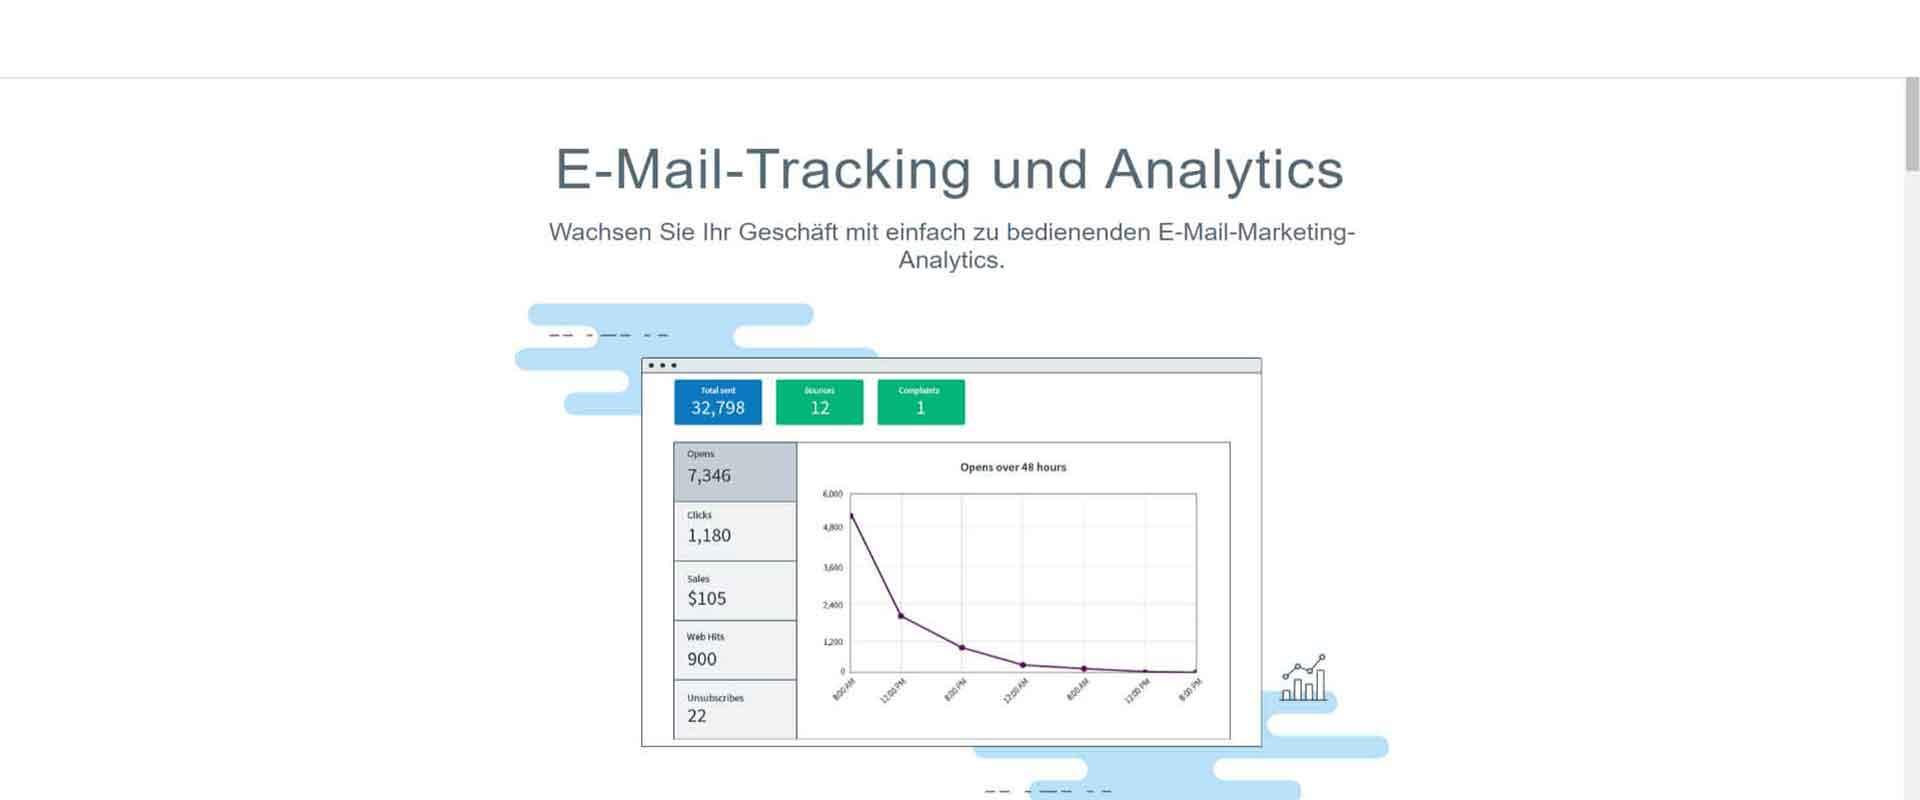 AW-E-Mail-Tracking-und-Analytics